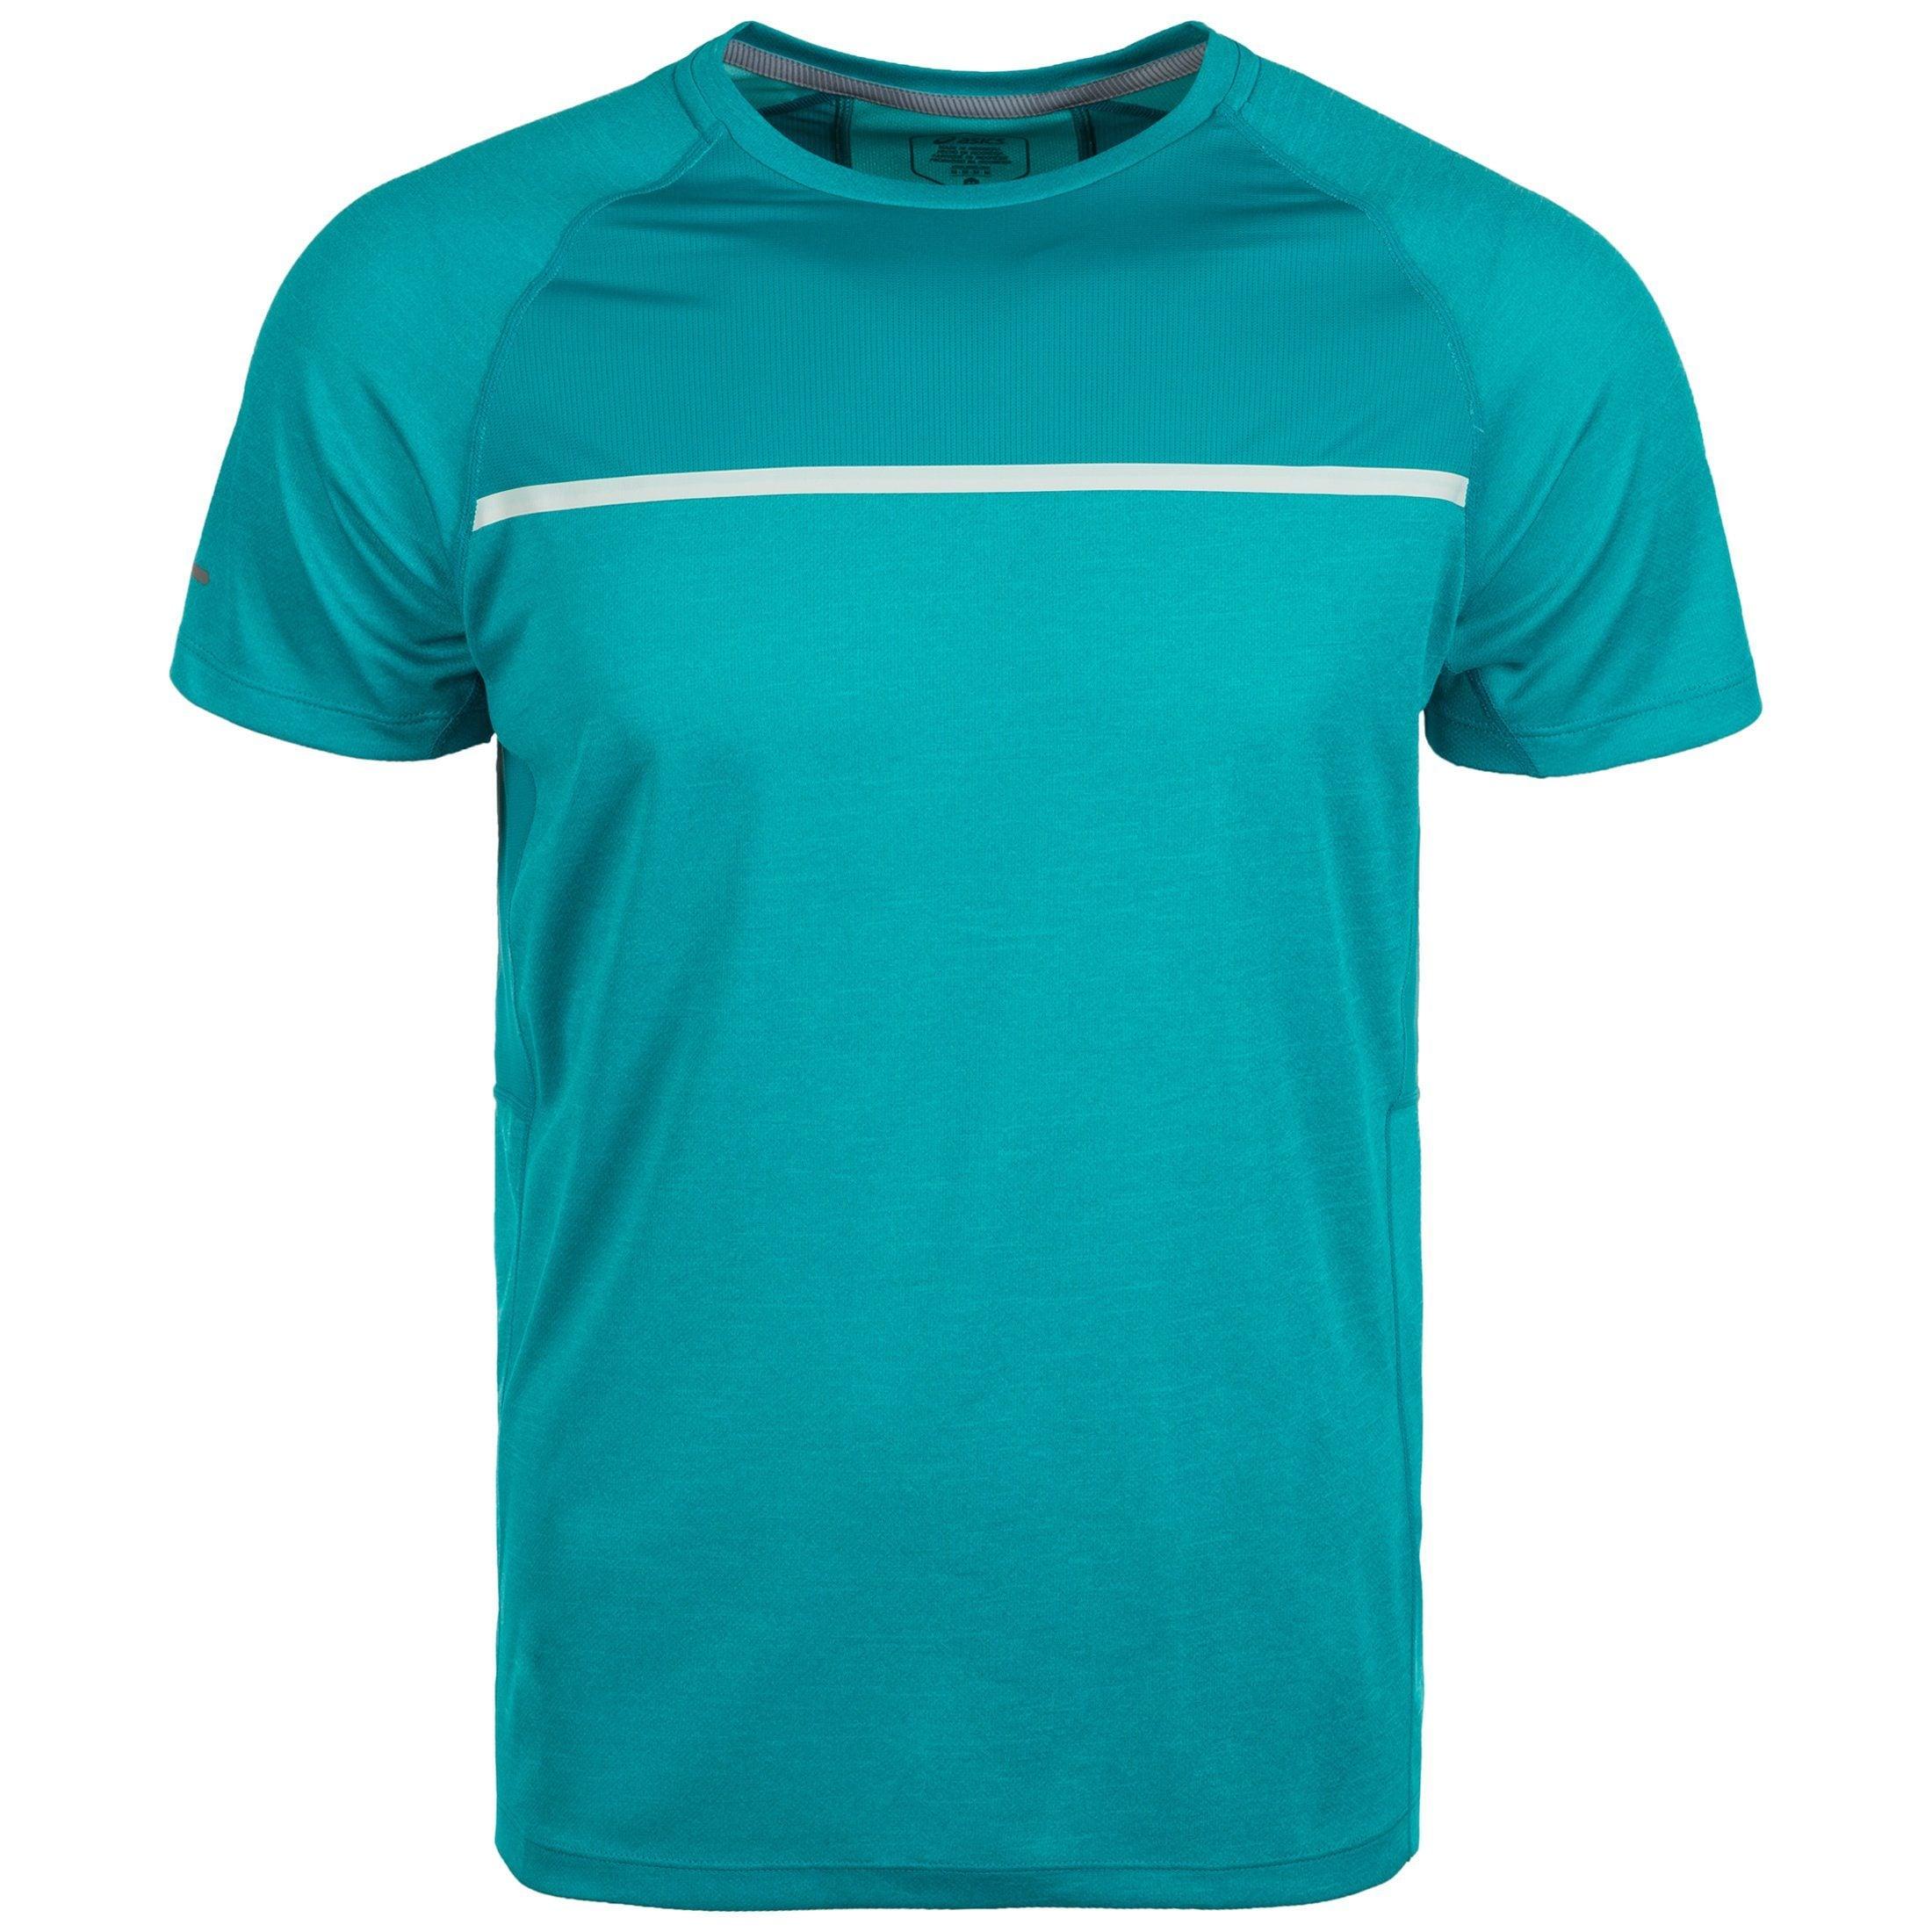 Asics Laufshirt Laufshirt   Sportbekleidung > Sportshirts > Laufshirts   Blau   Asics